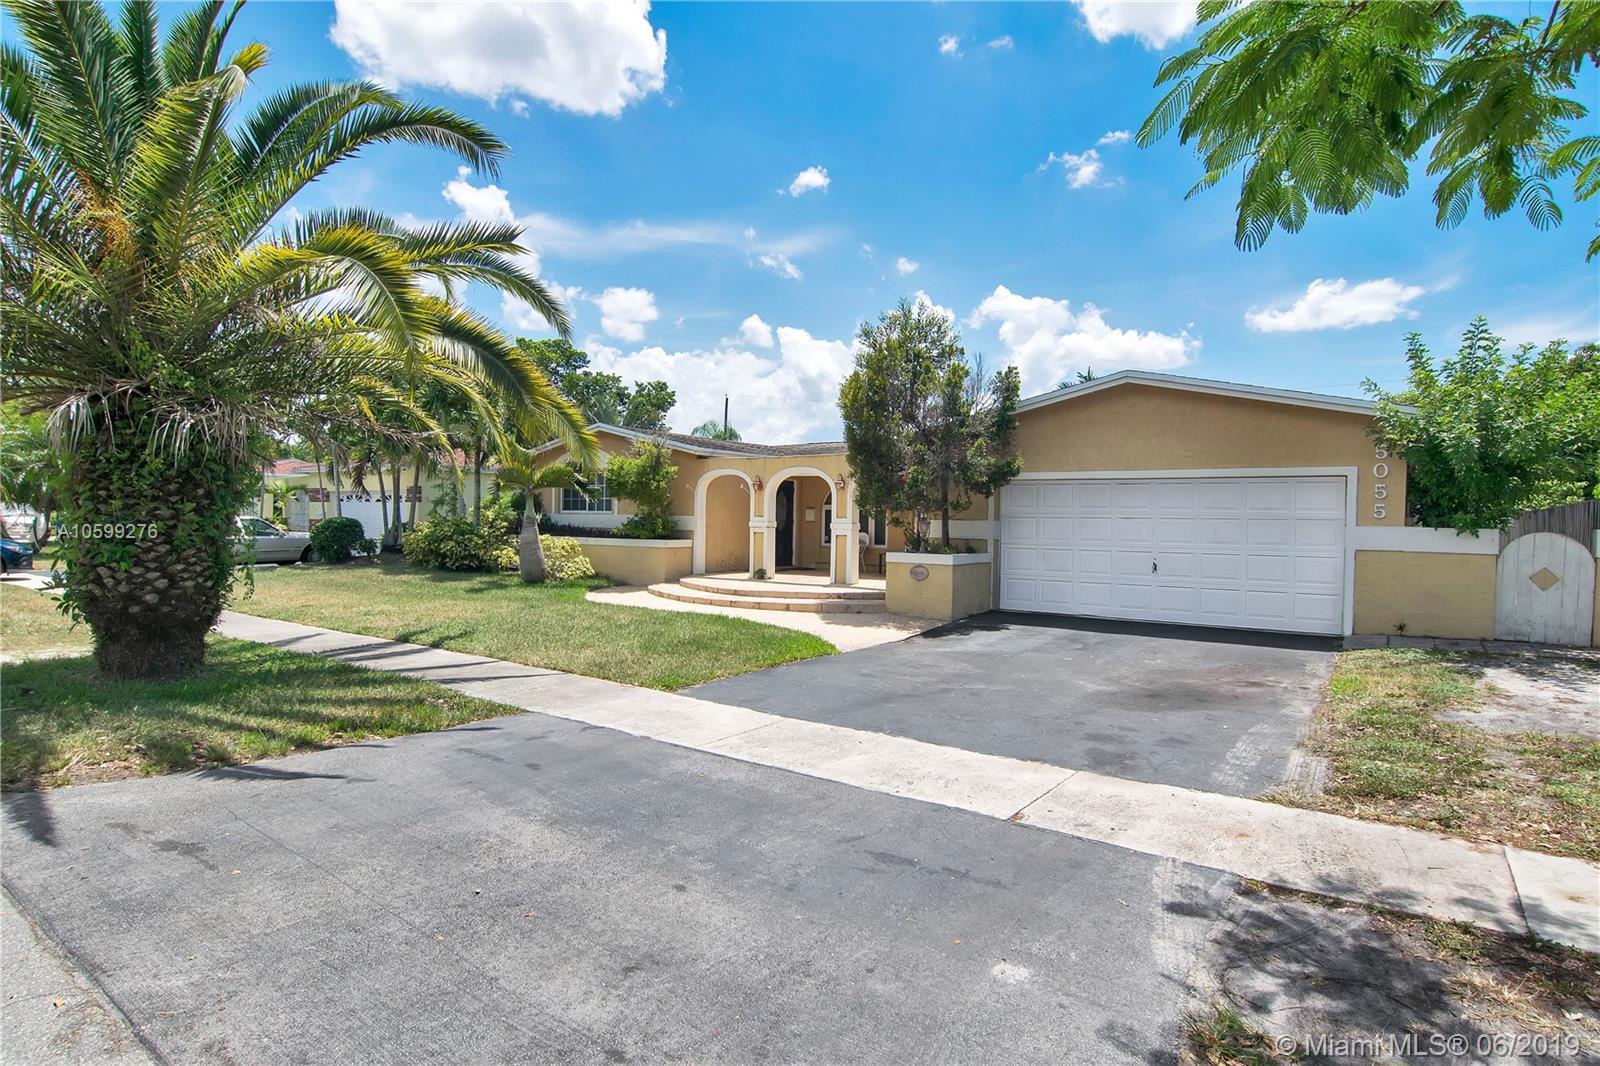 5055 SW 89th Ave, Cooper City, Florida